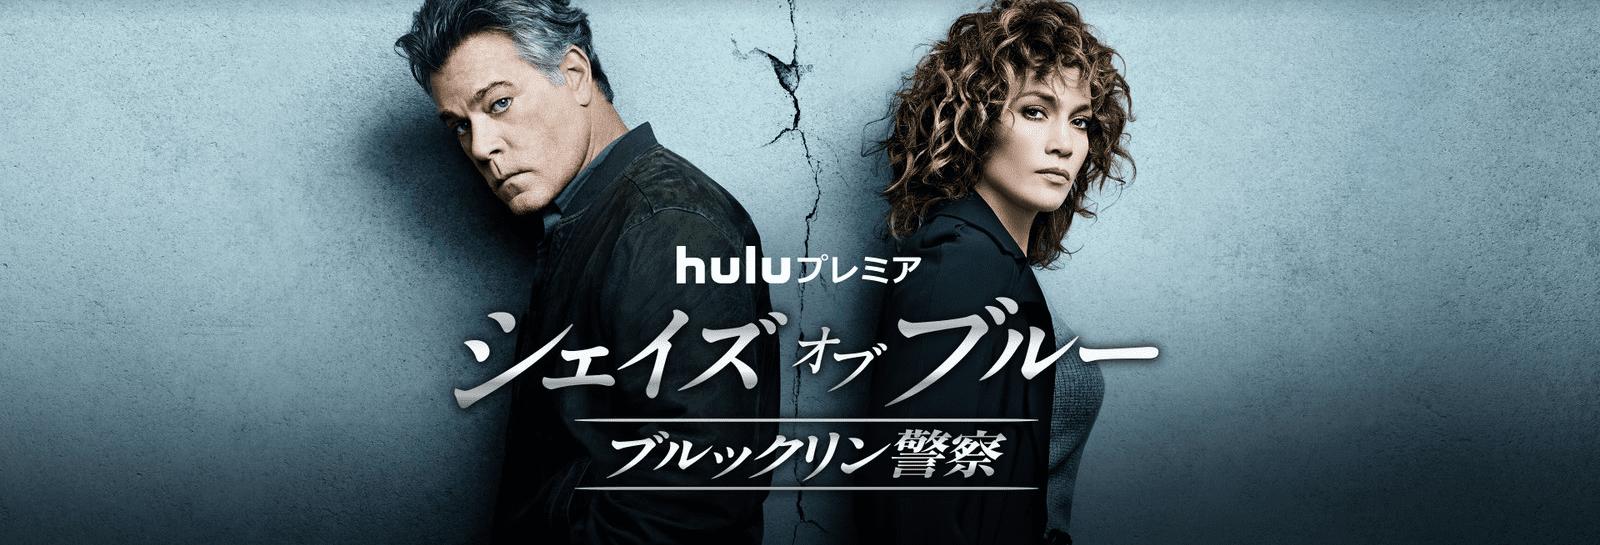 【Huluおすすめ海外ドラマ】Hulu(フールー)のおすすめ海外ドラマ作品一覧|ウォーキングデッド・ゲームオブスローンズ・Huluプレミア作品など充実!|Huluプレミア編:シェイズ・オブ・ブルー ブルックリン警察